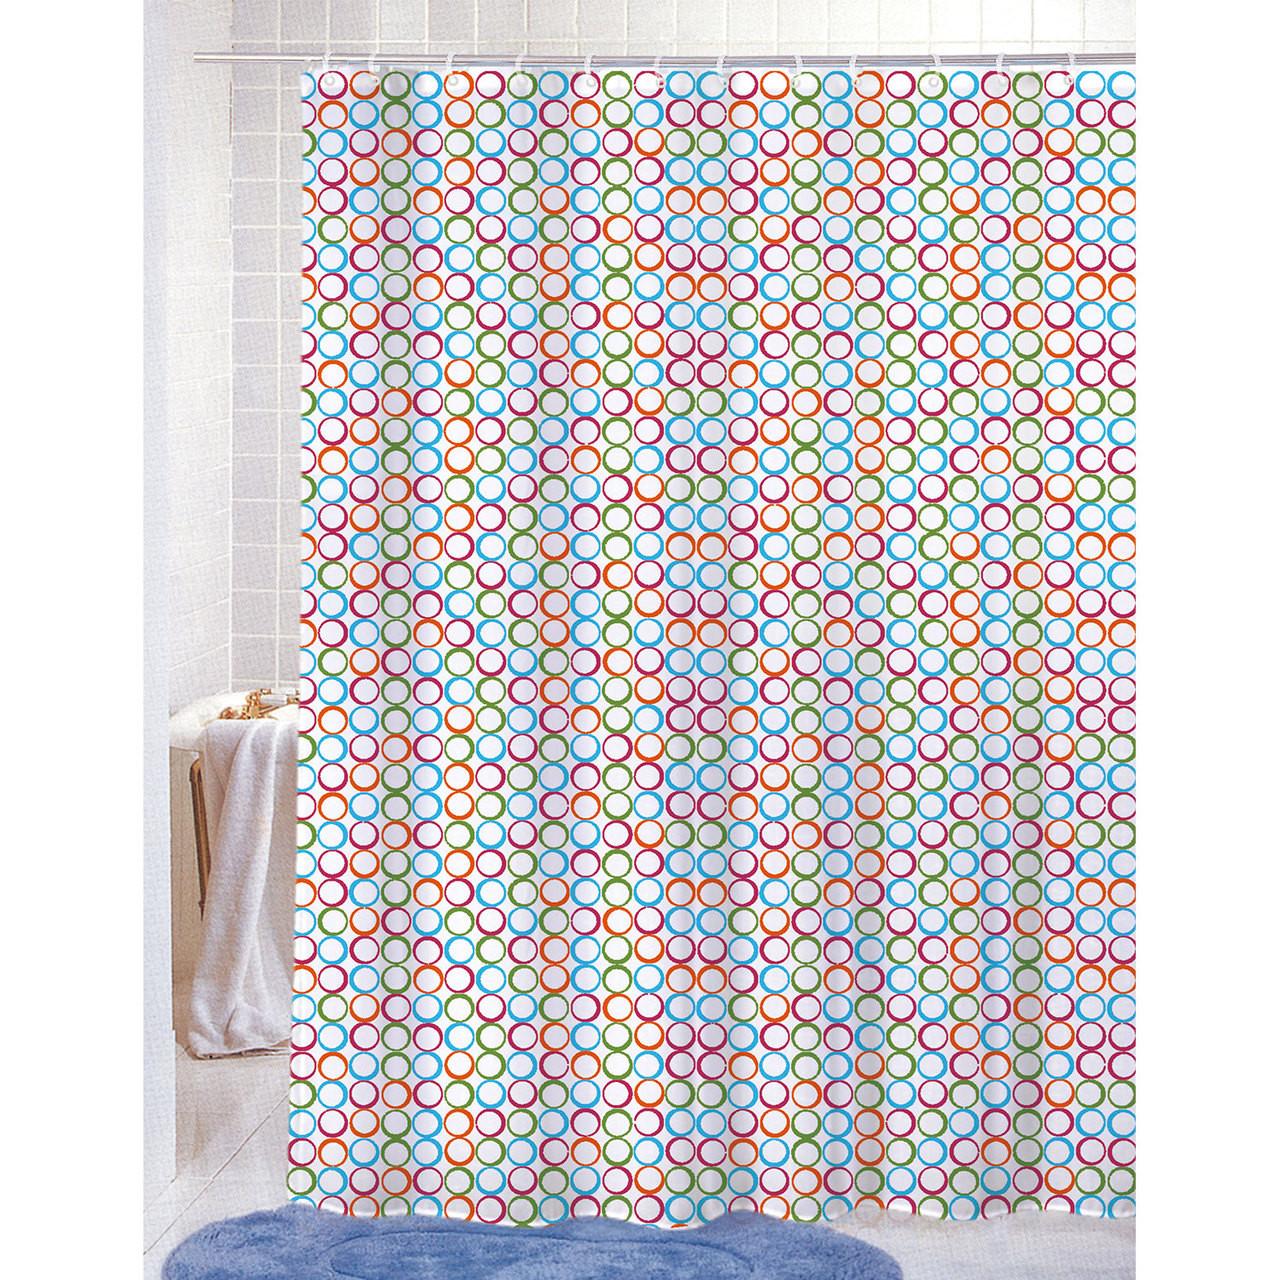 Printed Shower Curtain Pvc Free Peva Colorful Geometric Circles